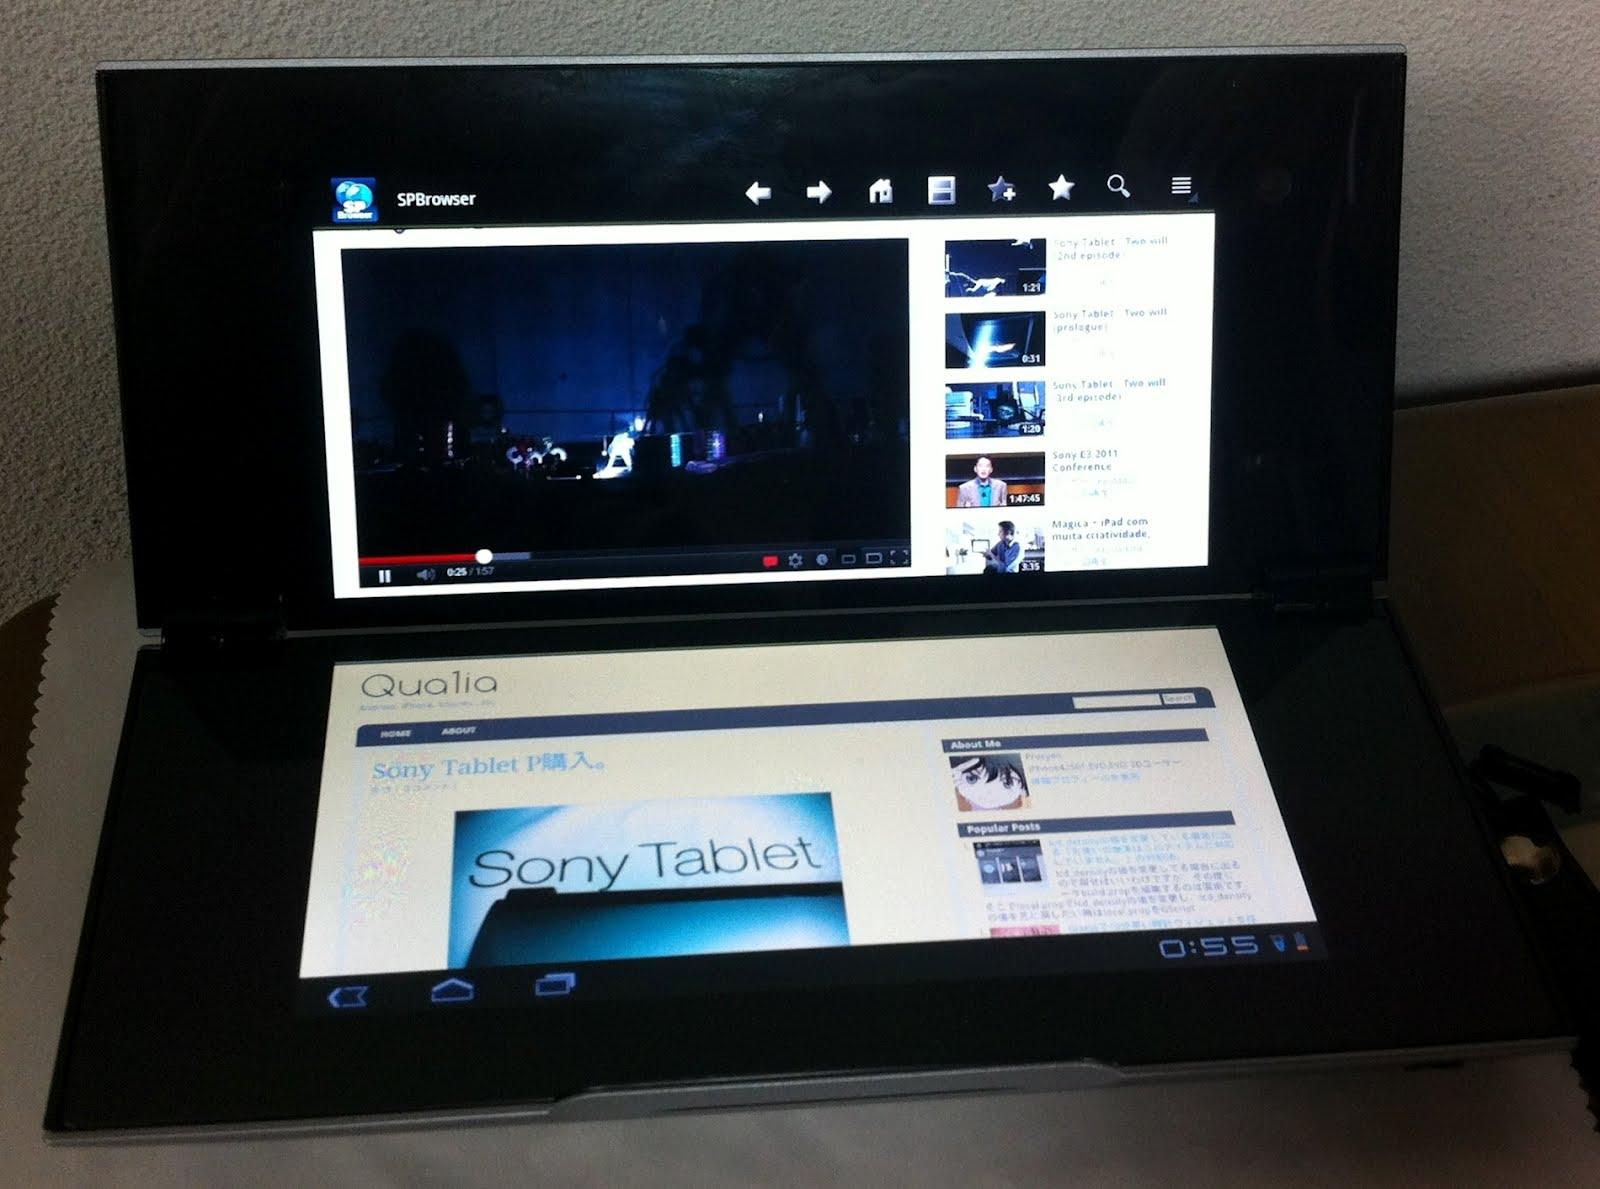 qua1ia sony tablet p 2 spbrowser. Black Bedroom Furniture Sets. Home Design Ideas